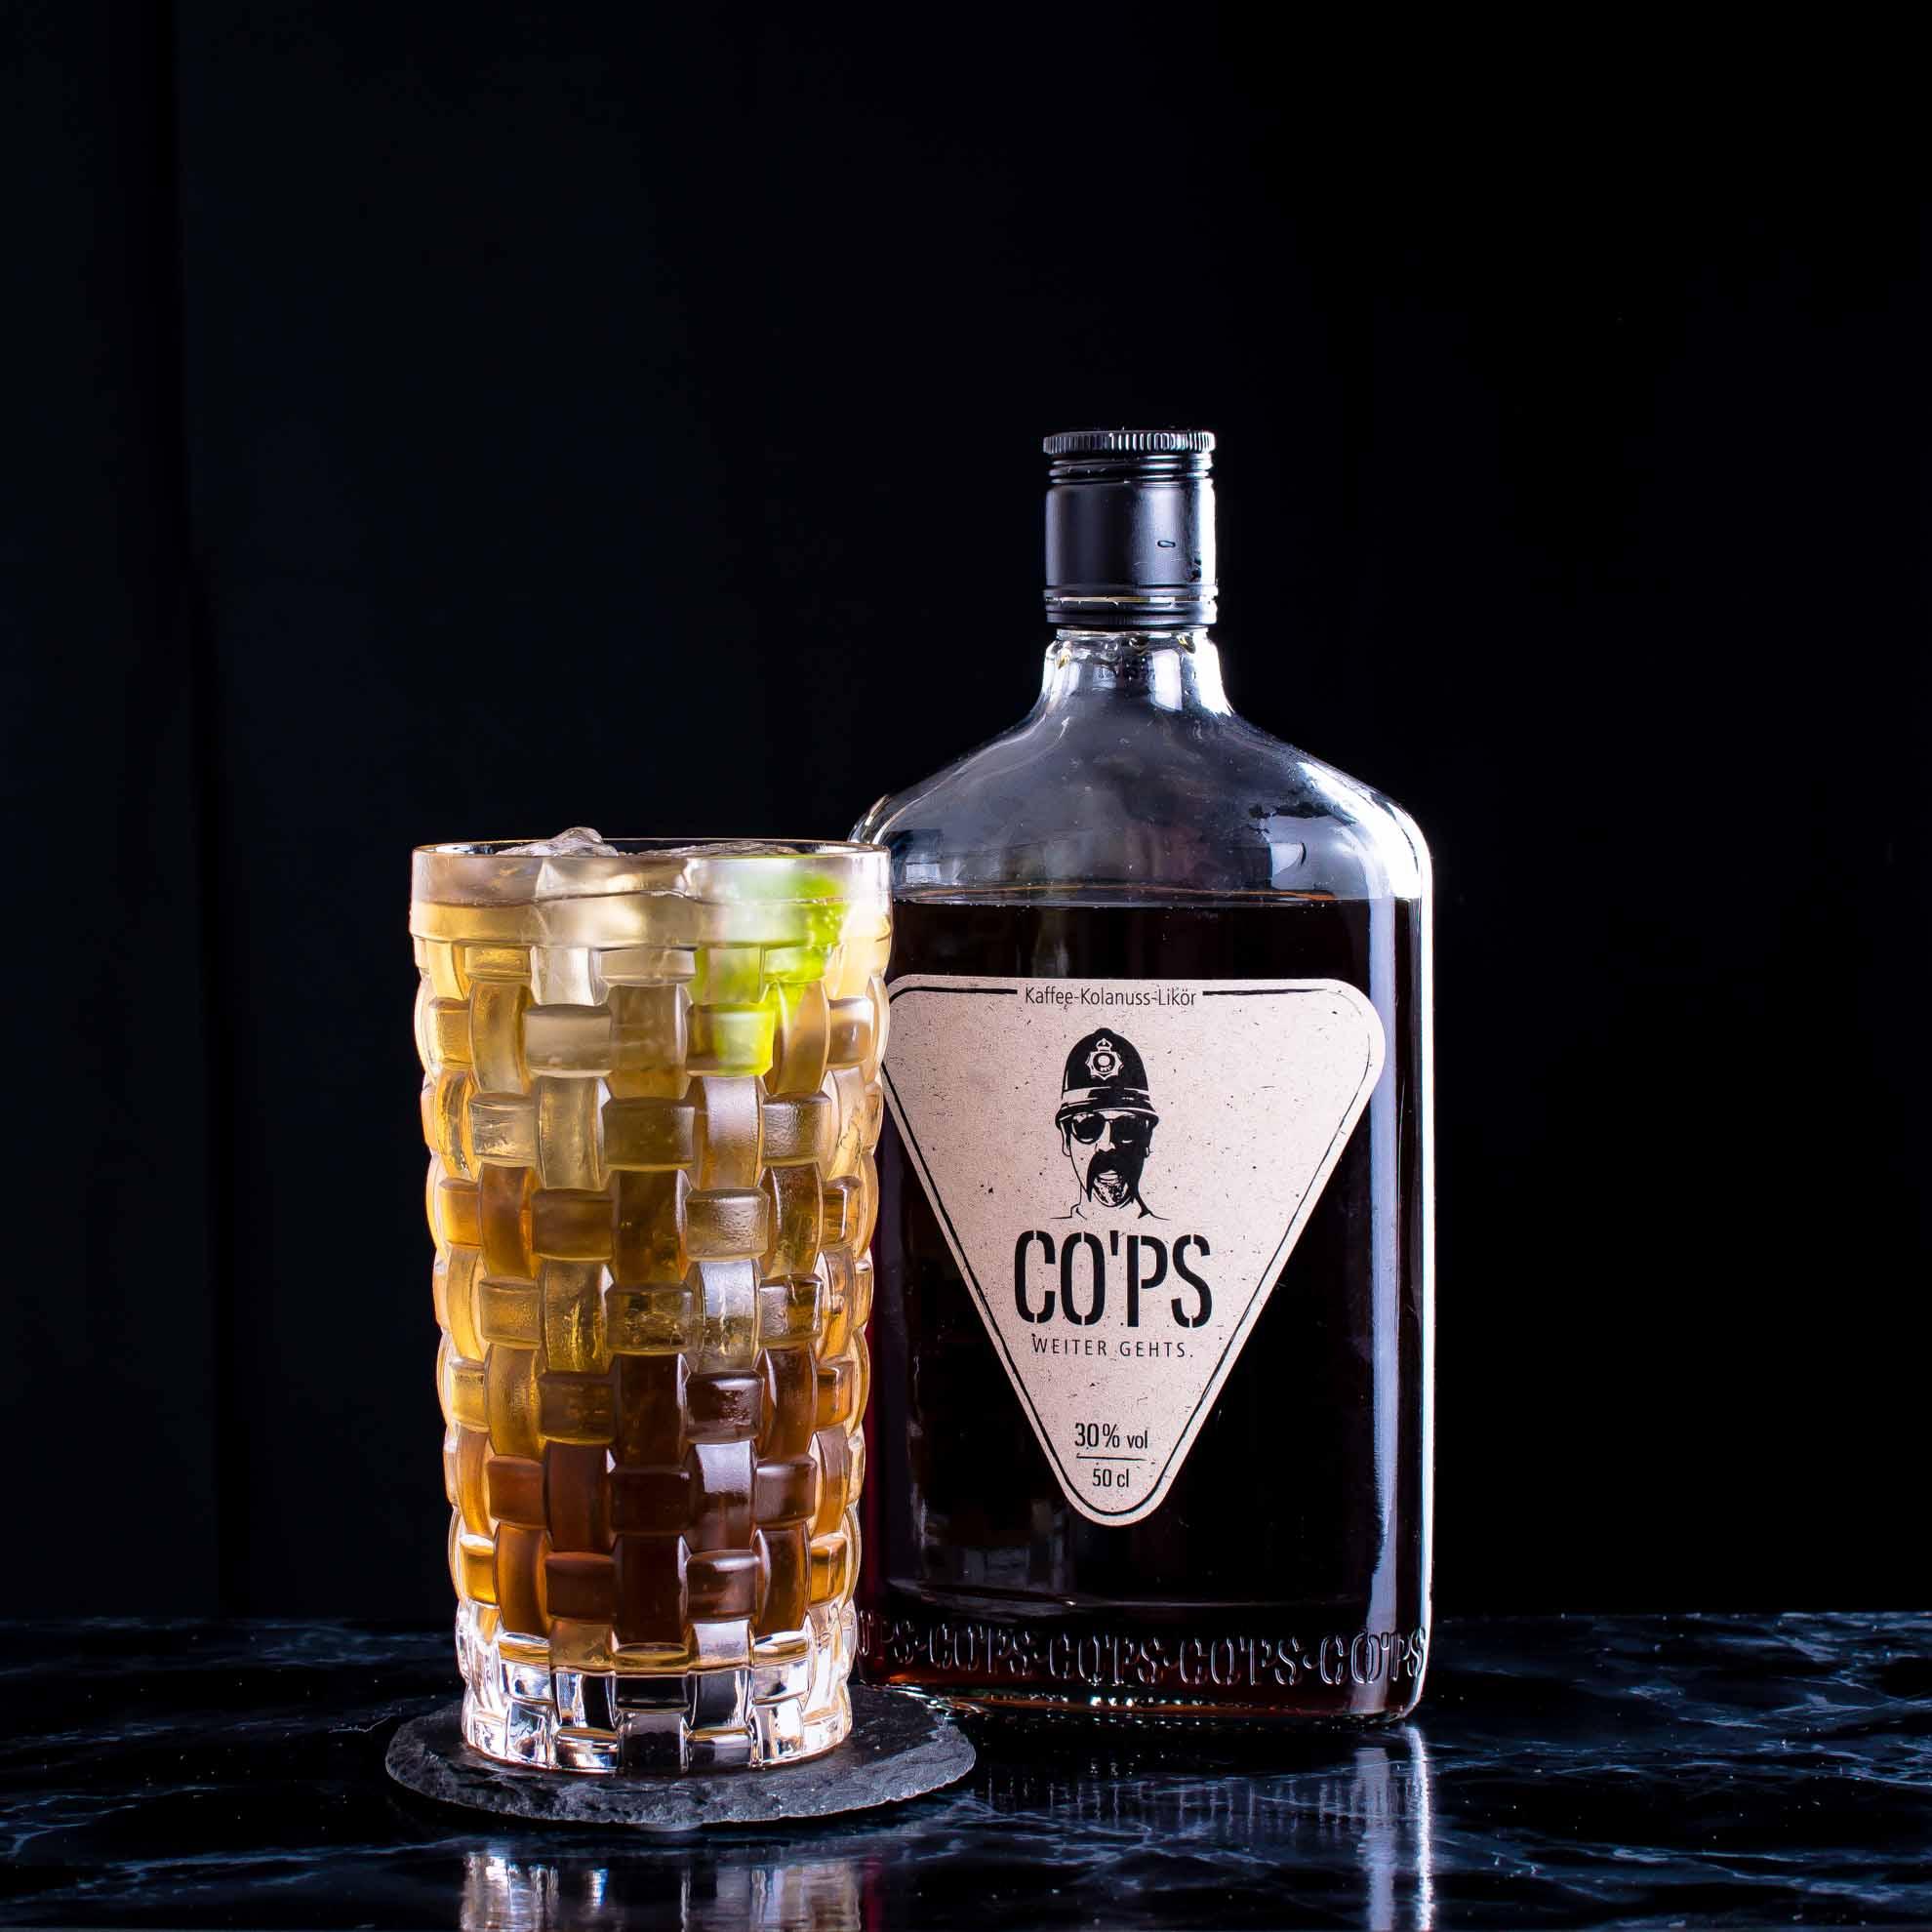 CO'PS im Enhanced Rum & Coke.